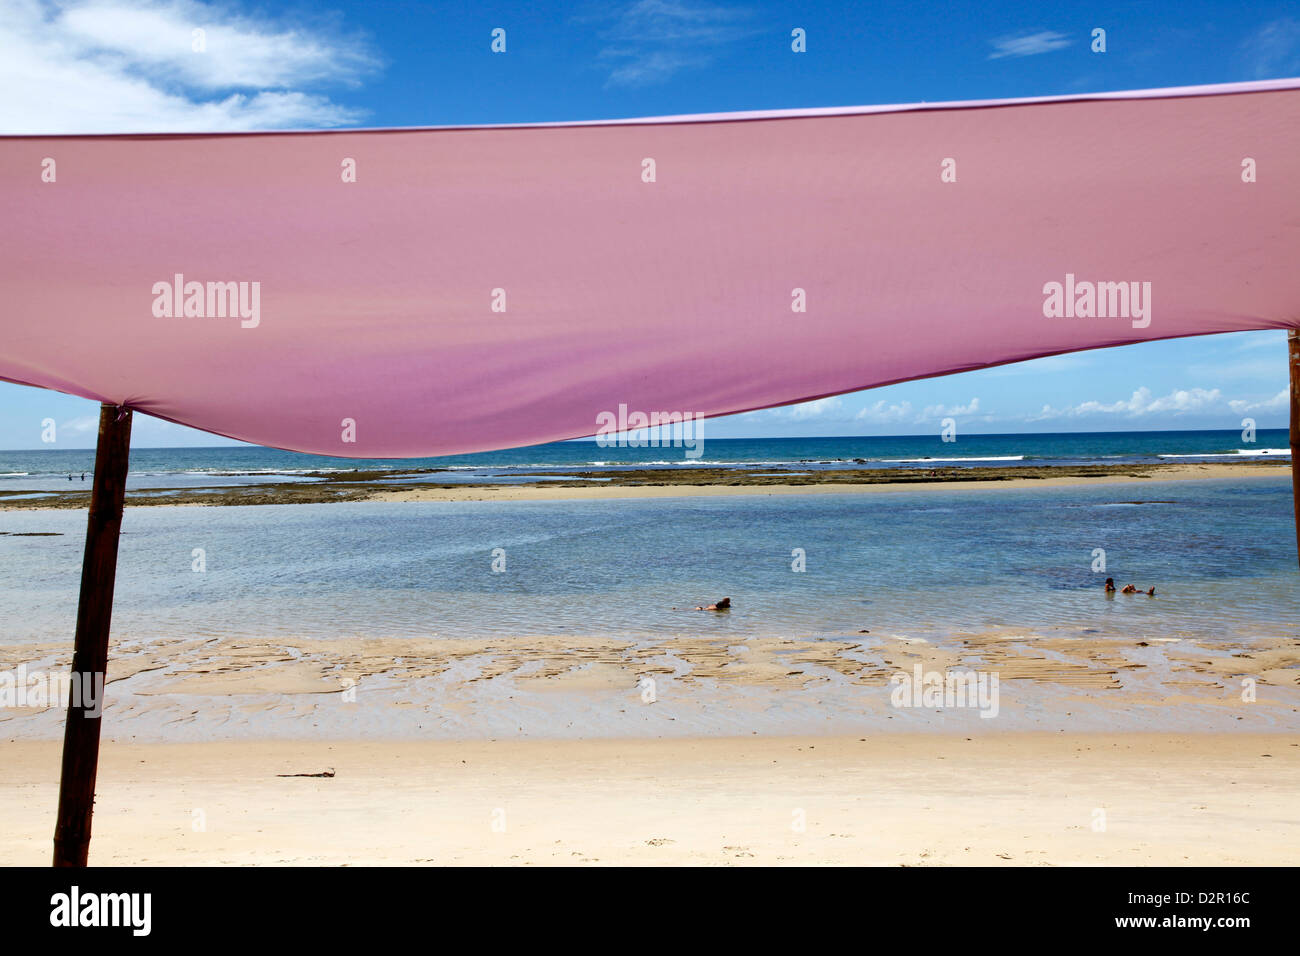 People swimming at Parracho Beach, Arraial d'Ajuda, Bahia, Brazil, South America - Stock Image